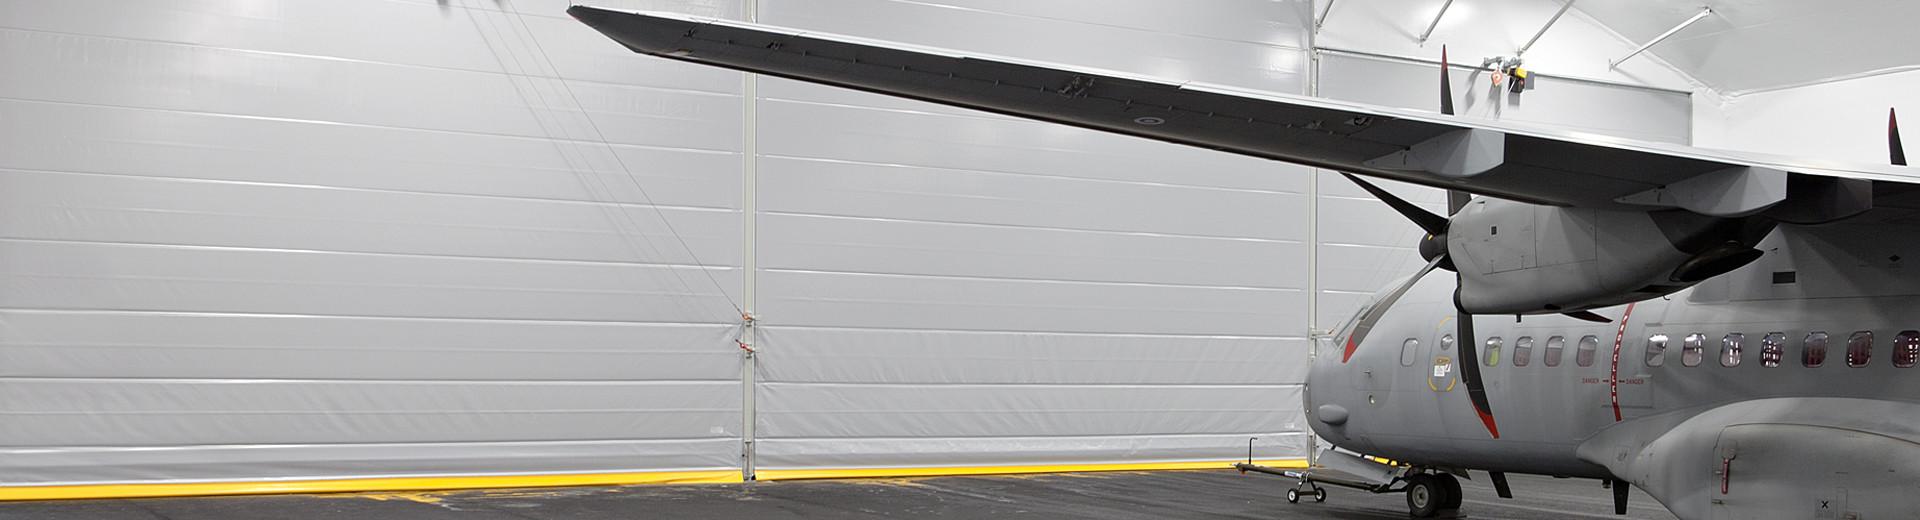 best doors in garage replacement craftsman photo door opener unbelievable concept champion full access hinges size remote of repair battery manual